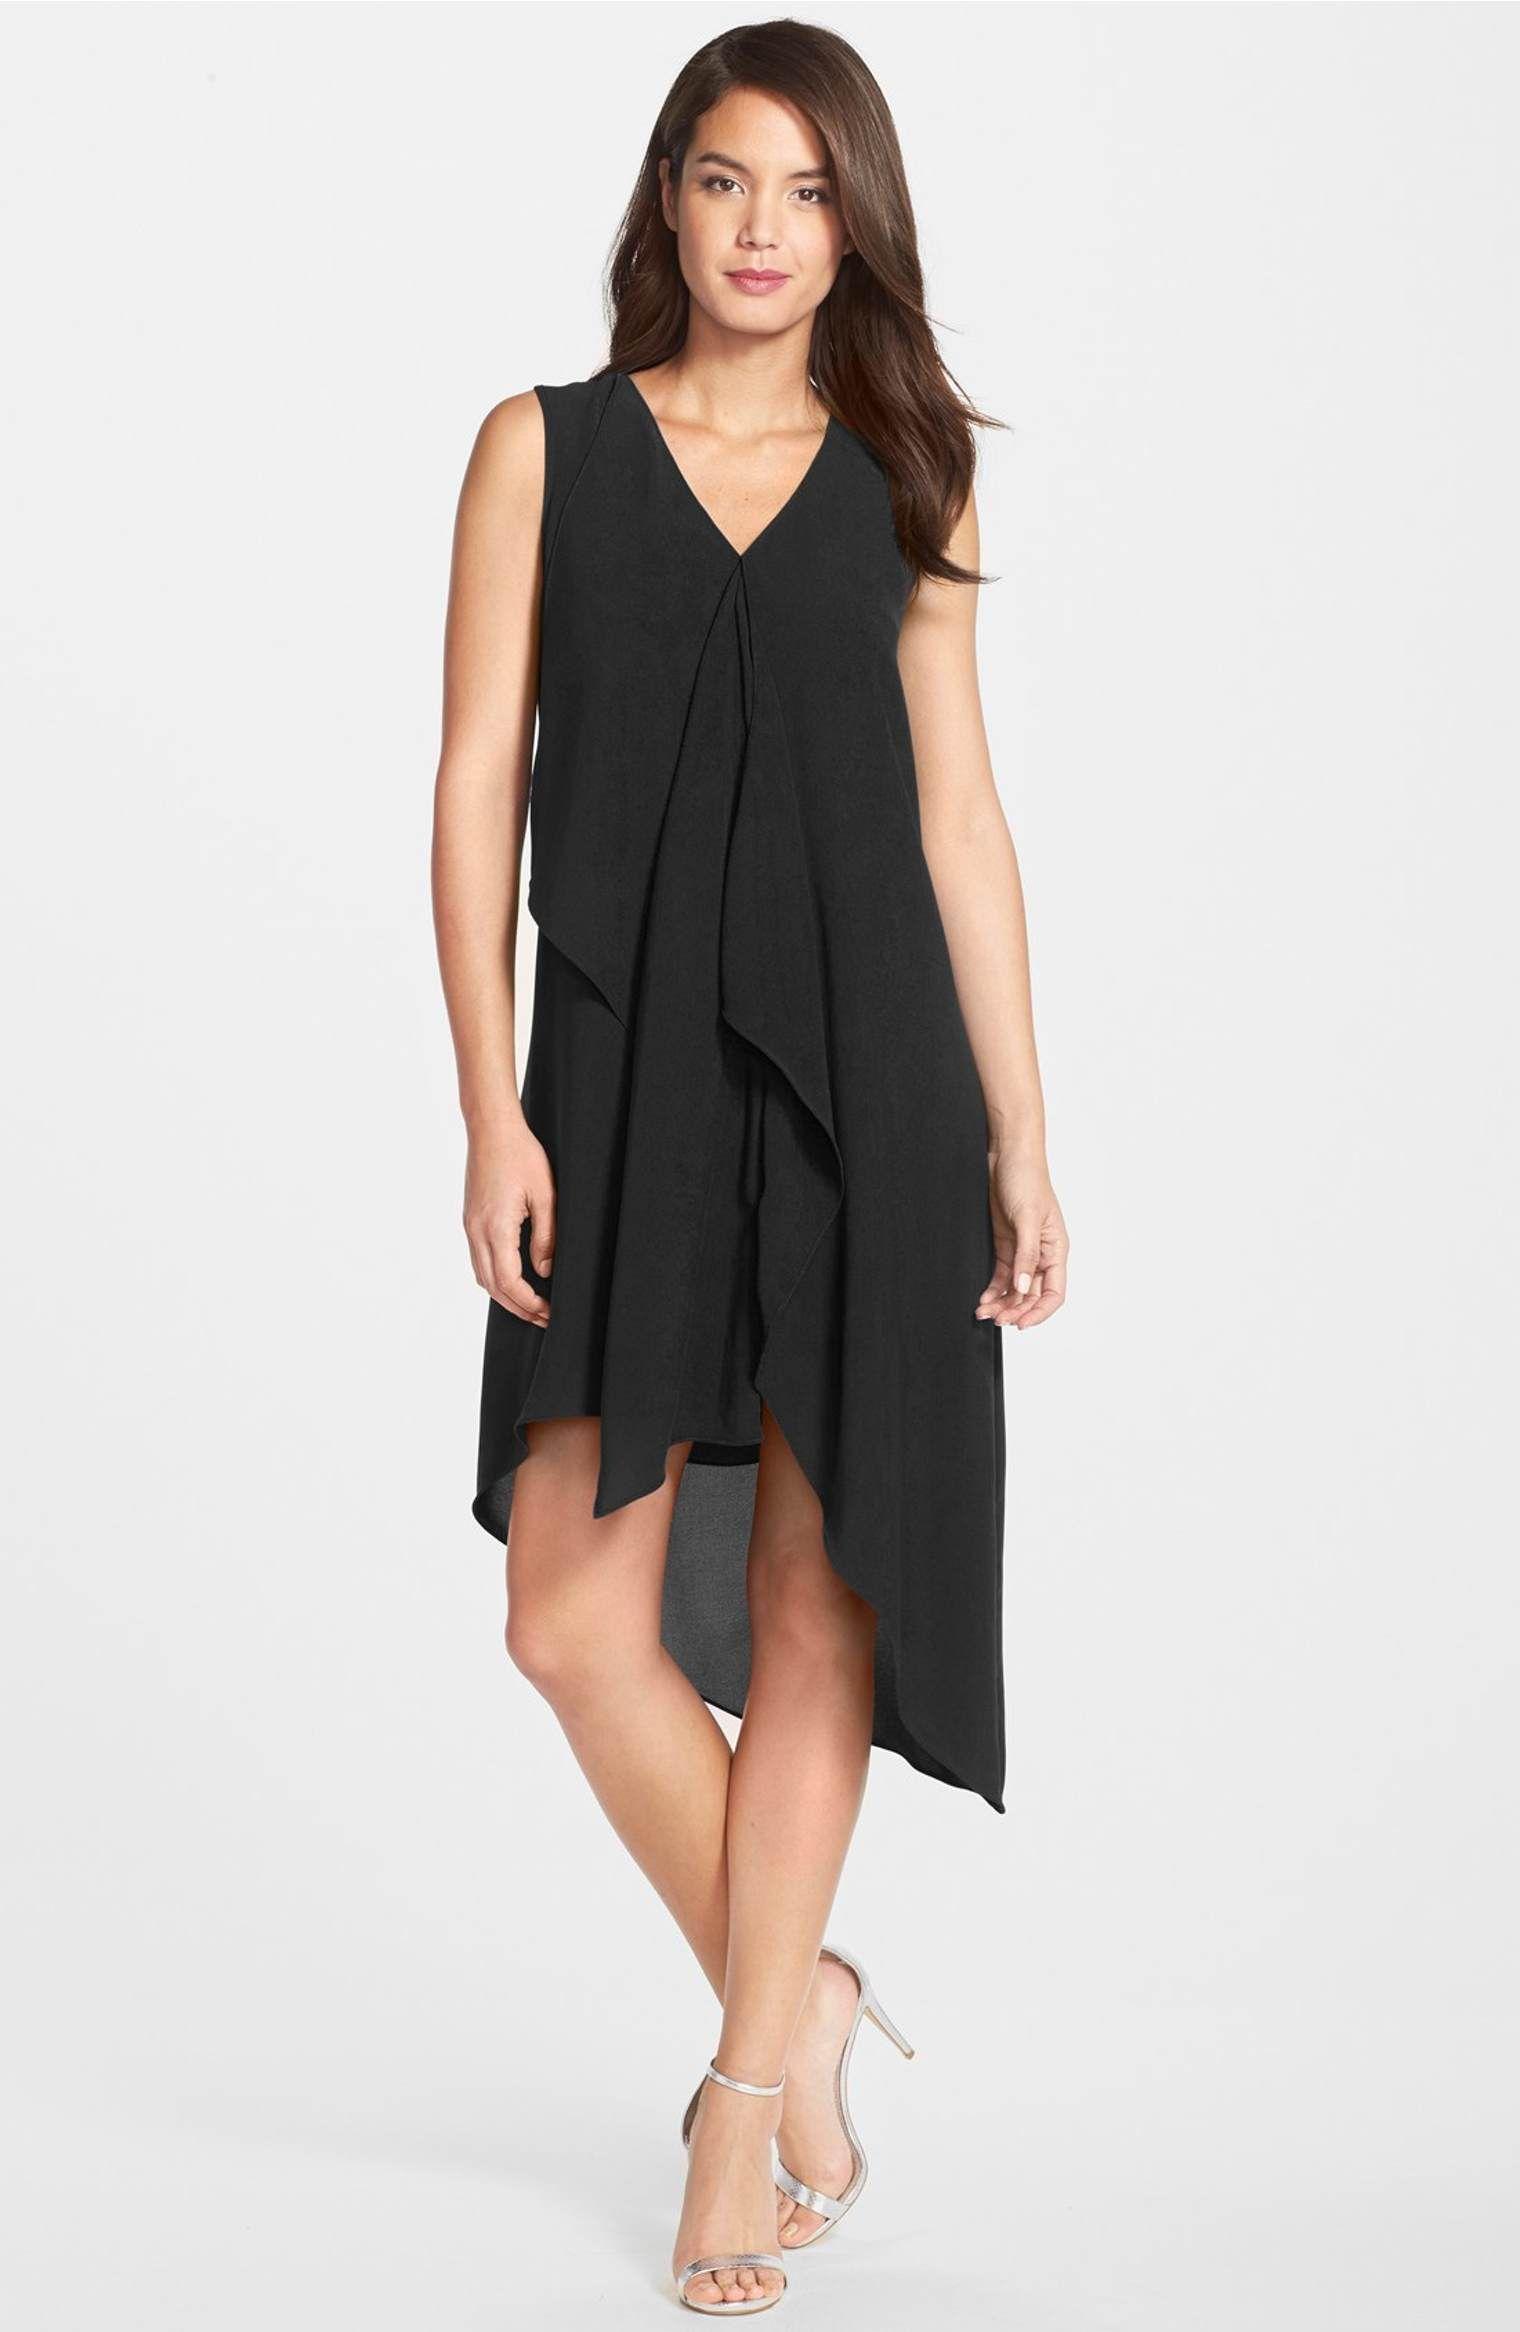 d72604da7f881c Main Image - Adrianna Papell Ruffle Front Crepe High/Low Dress (Regular &  Petite)